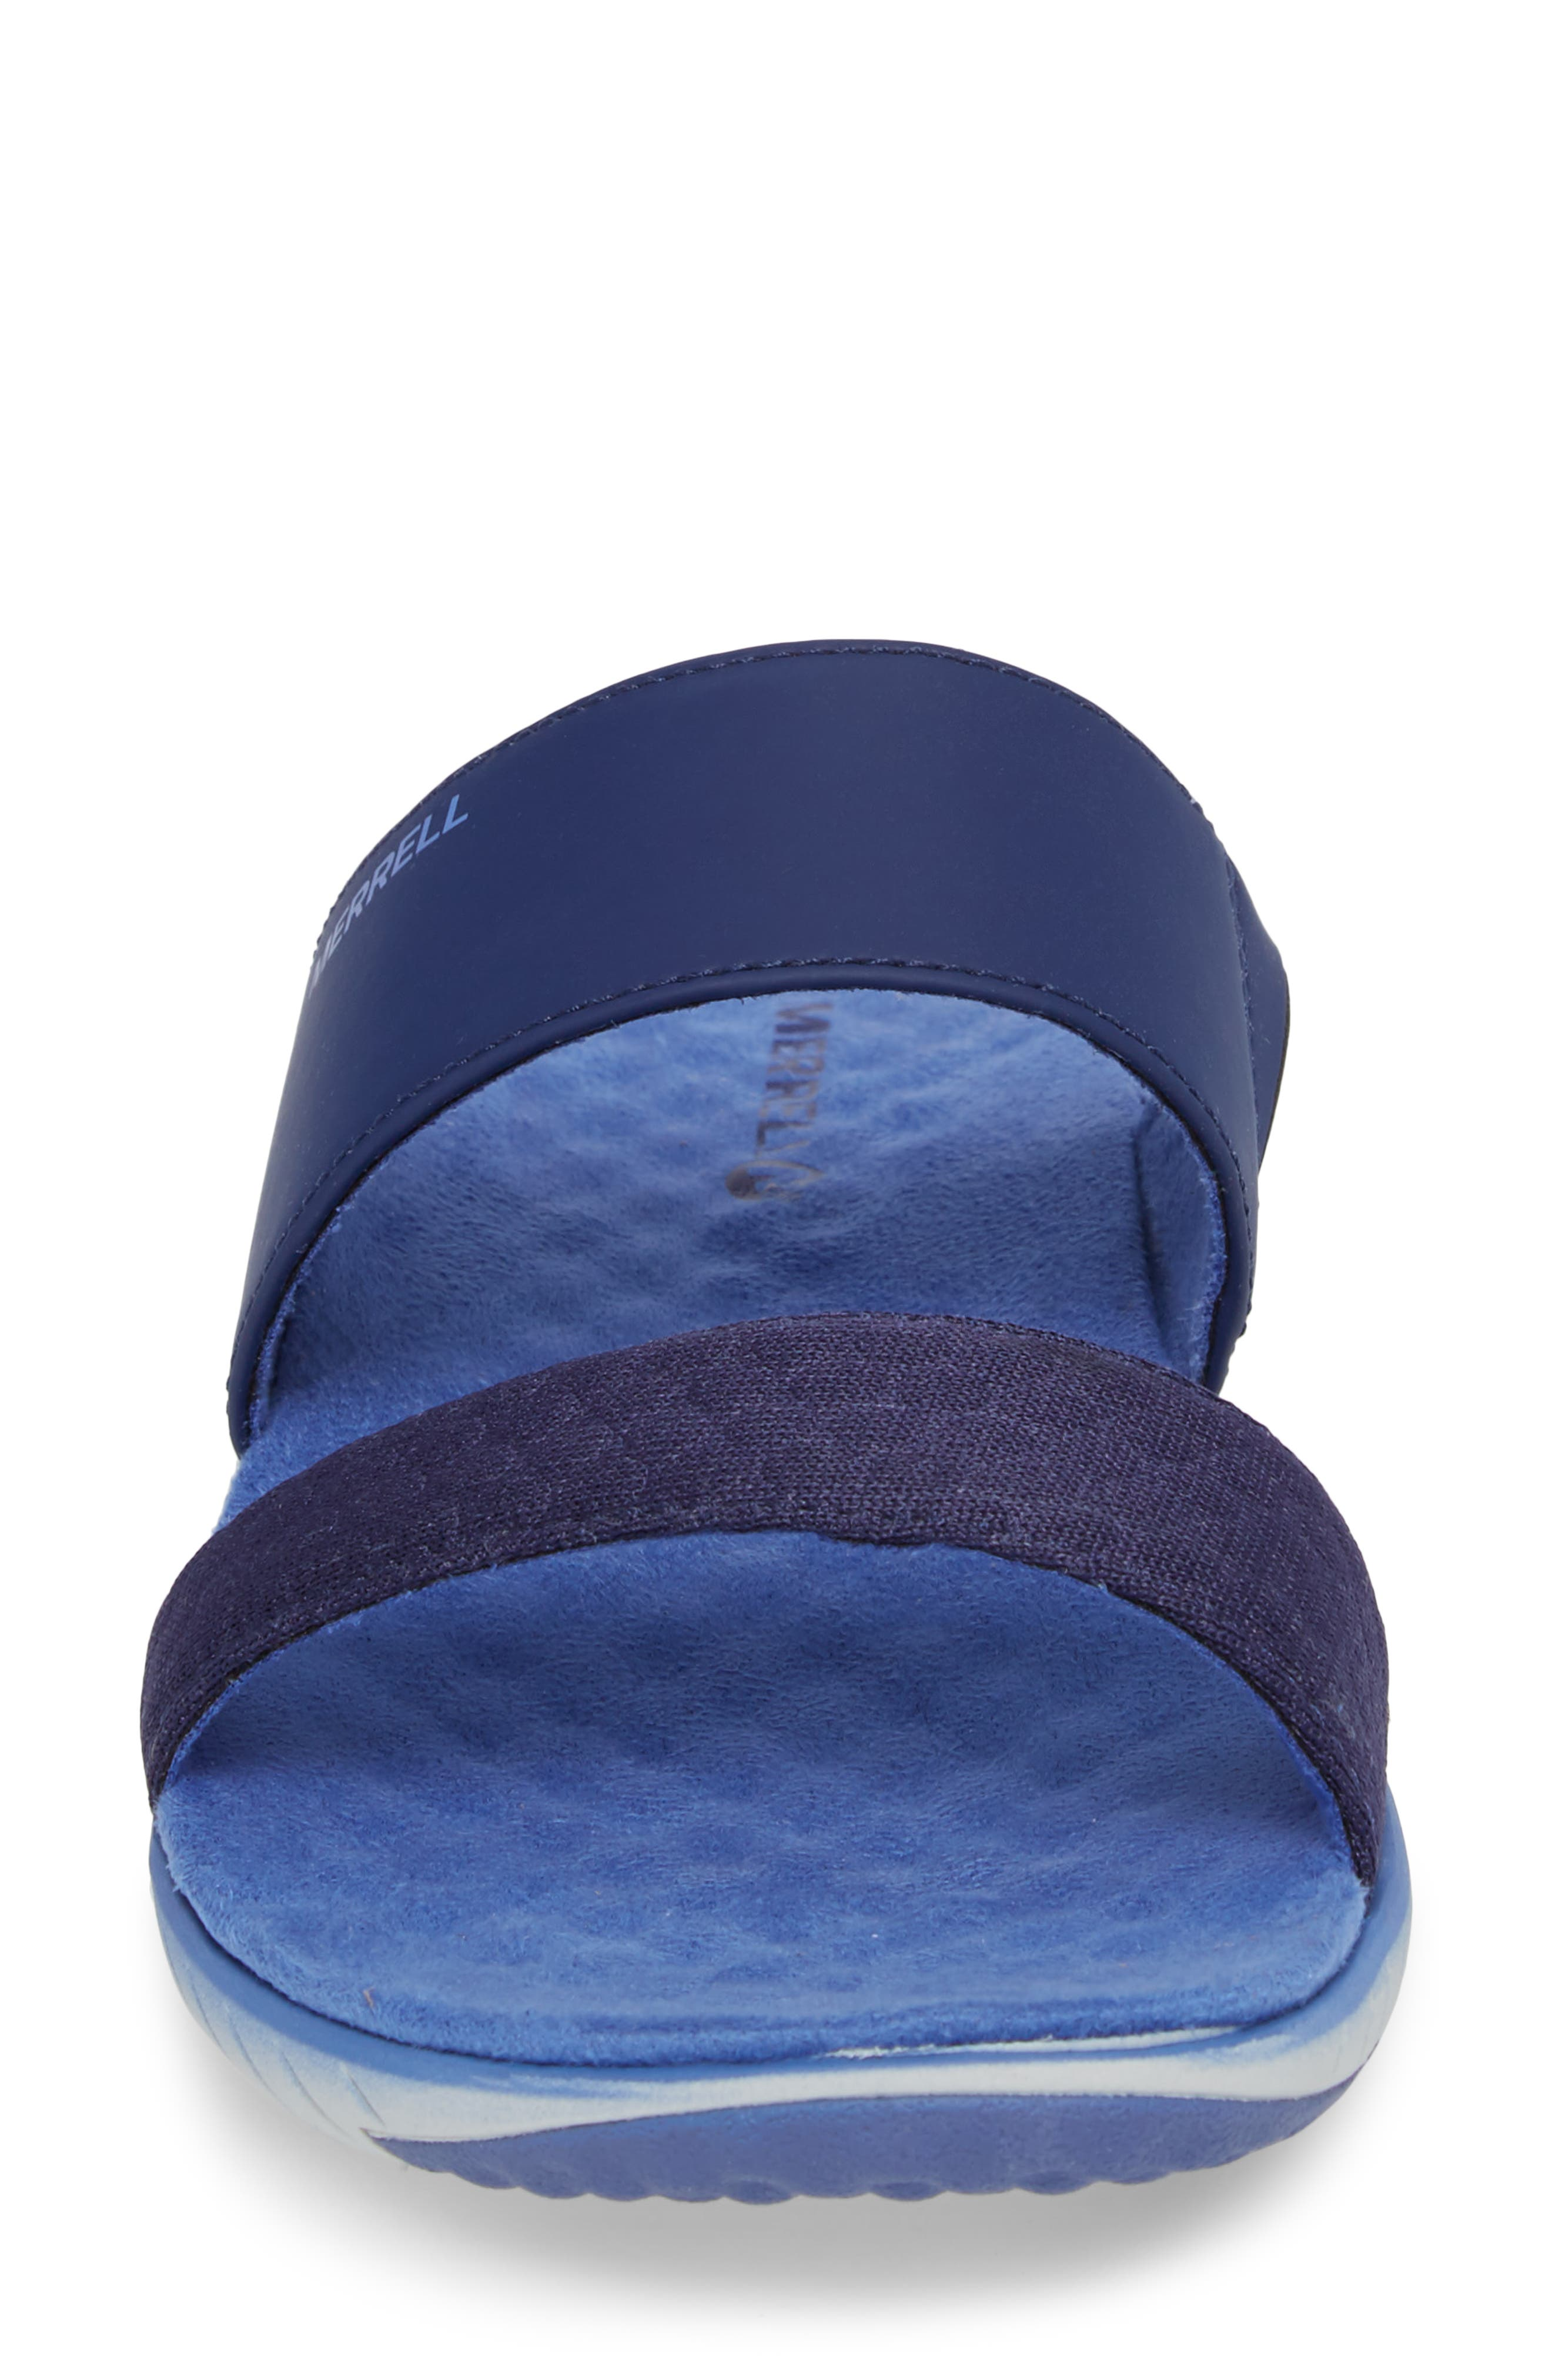 1SIX8 Linna Air Cushion+ Slide Sandal,                             Alternate thumbnail 15, color,